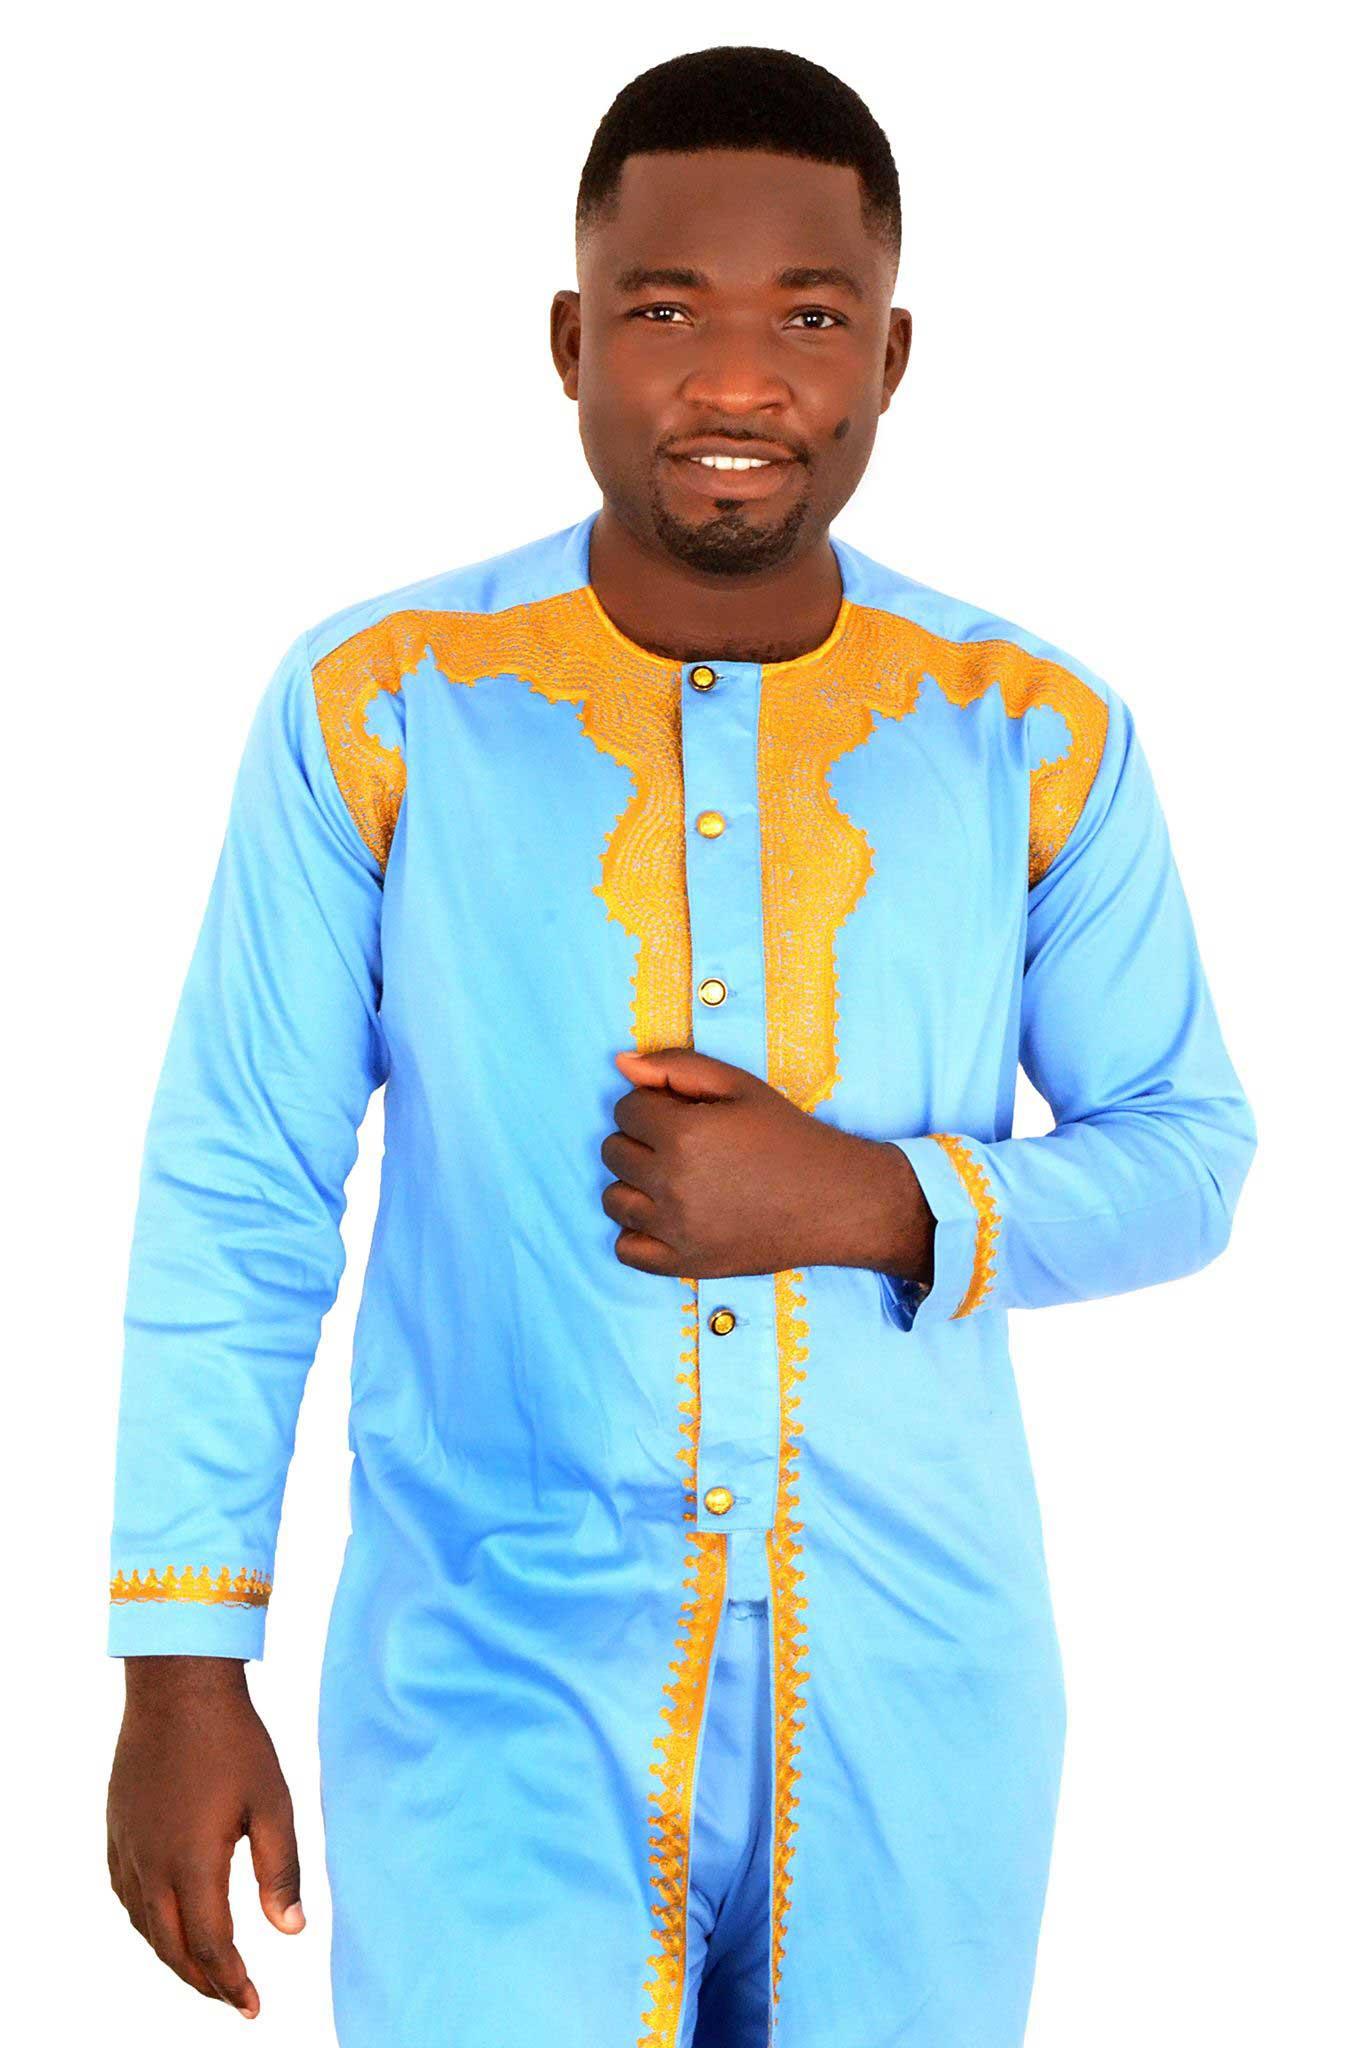 Solomon Bismark Arthur 3 - Abstain from nudity to avoid regrets in the future–Gospel musician advises